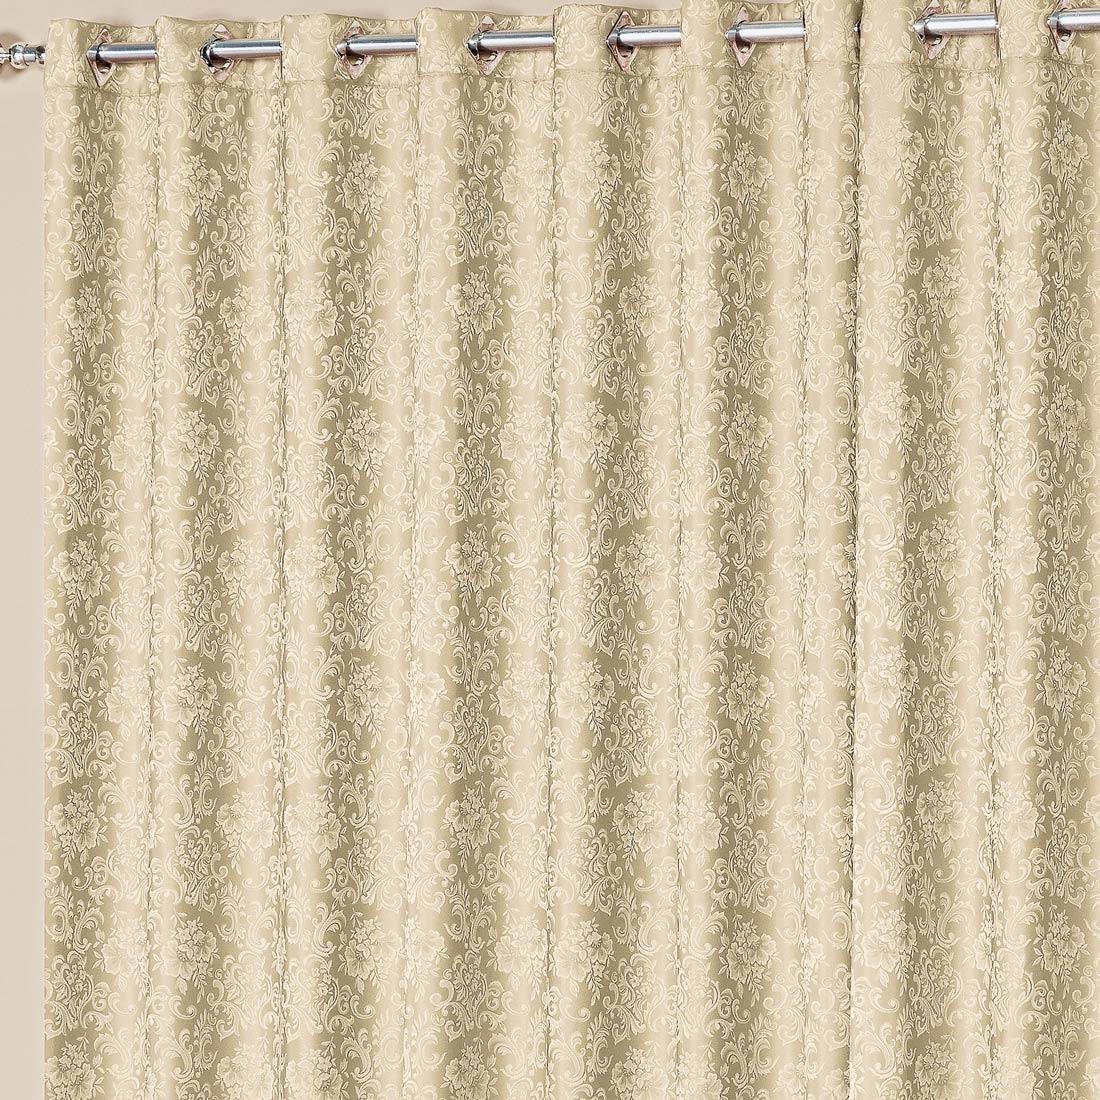 Cortina Nobre Jacquard Palha 3,00m x 2,50m p/ Varão Simples